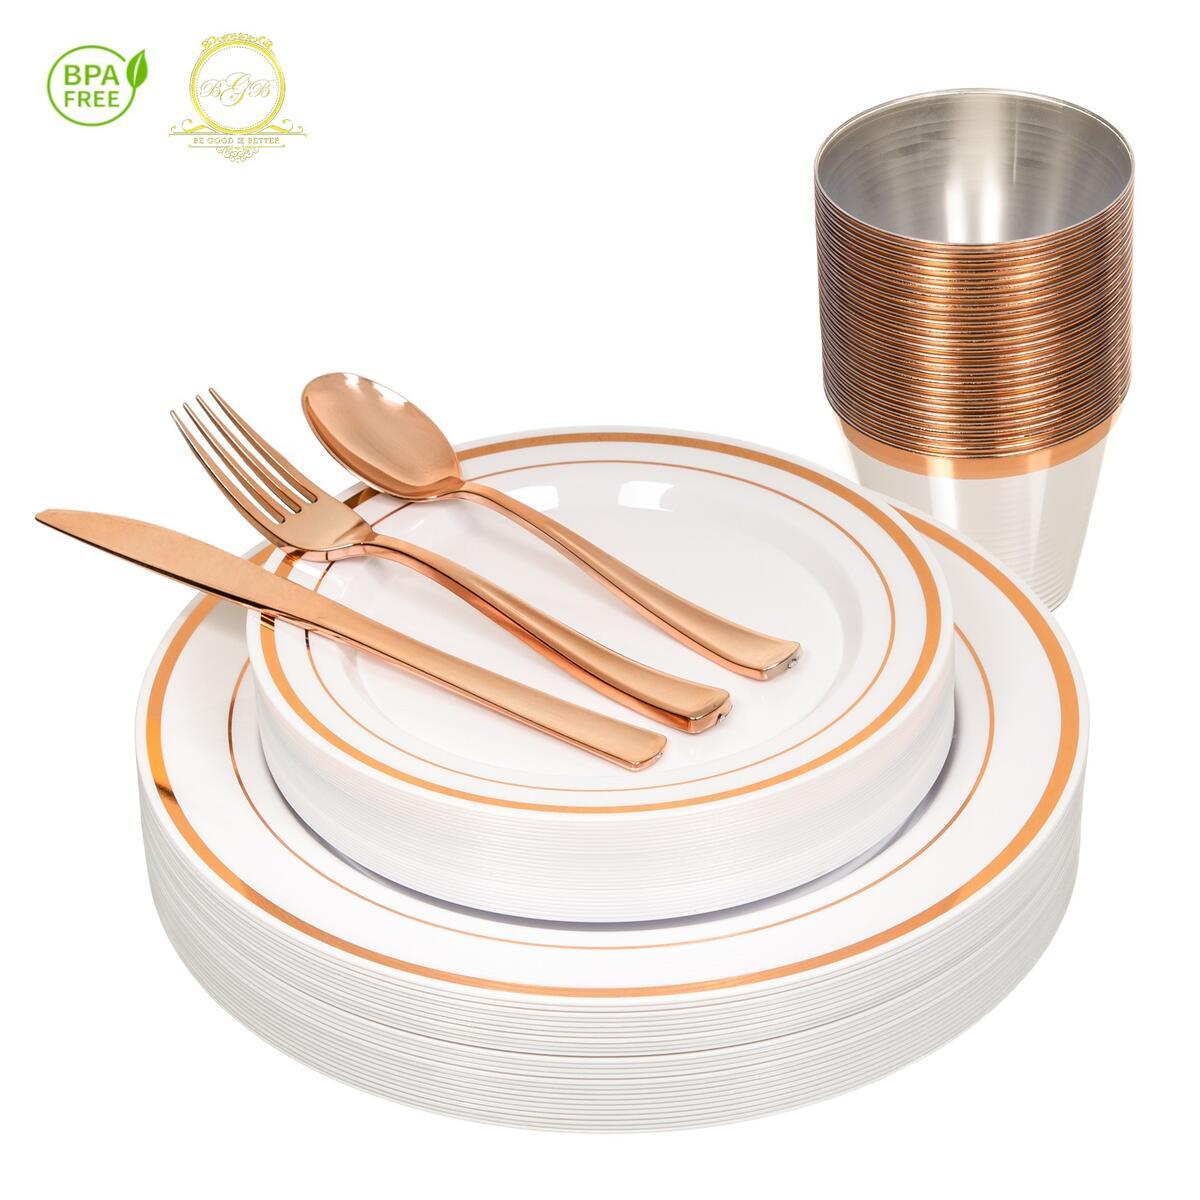 Elegant and Heavy Duty  Rose Gold Plastic Dinnerware - 156 Piece Set